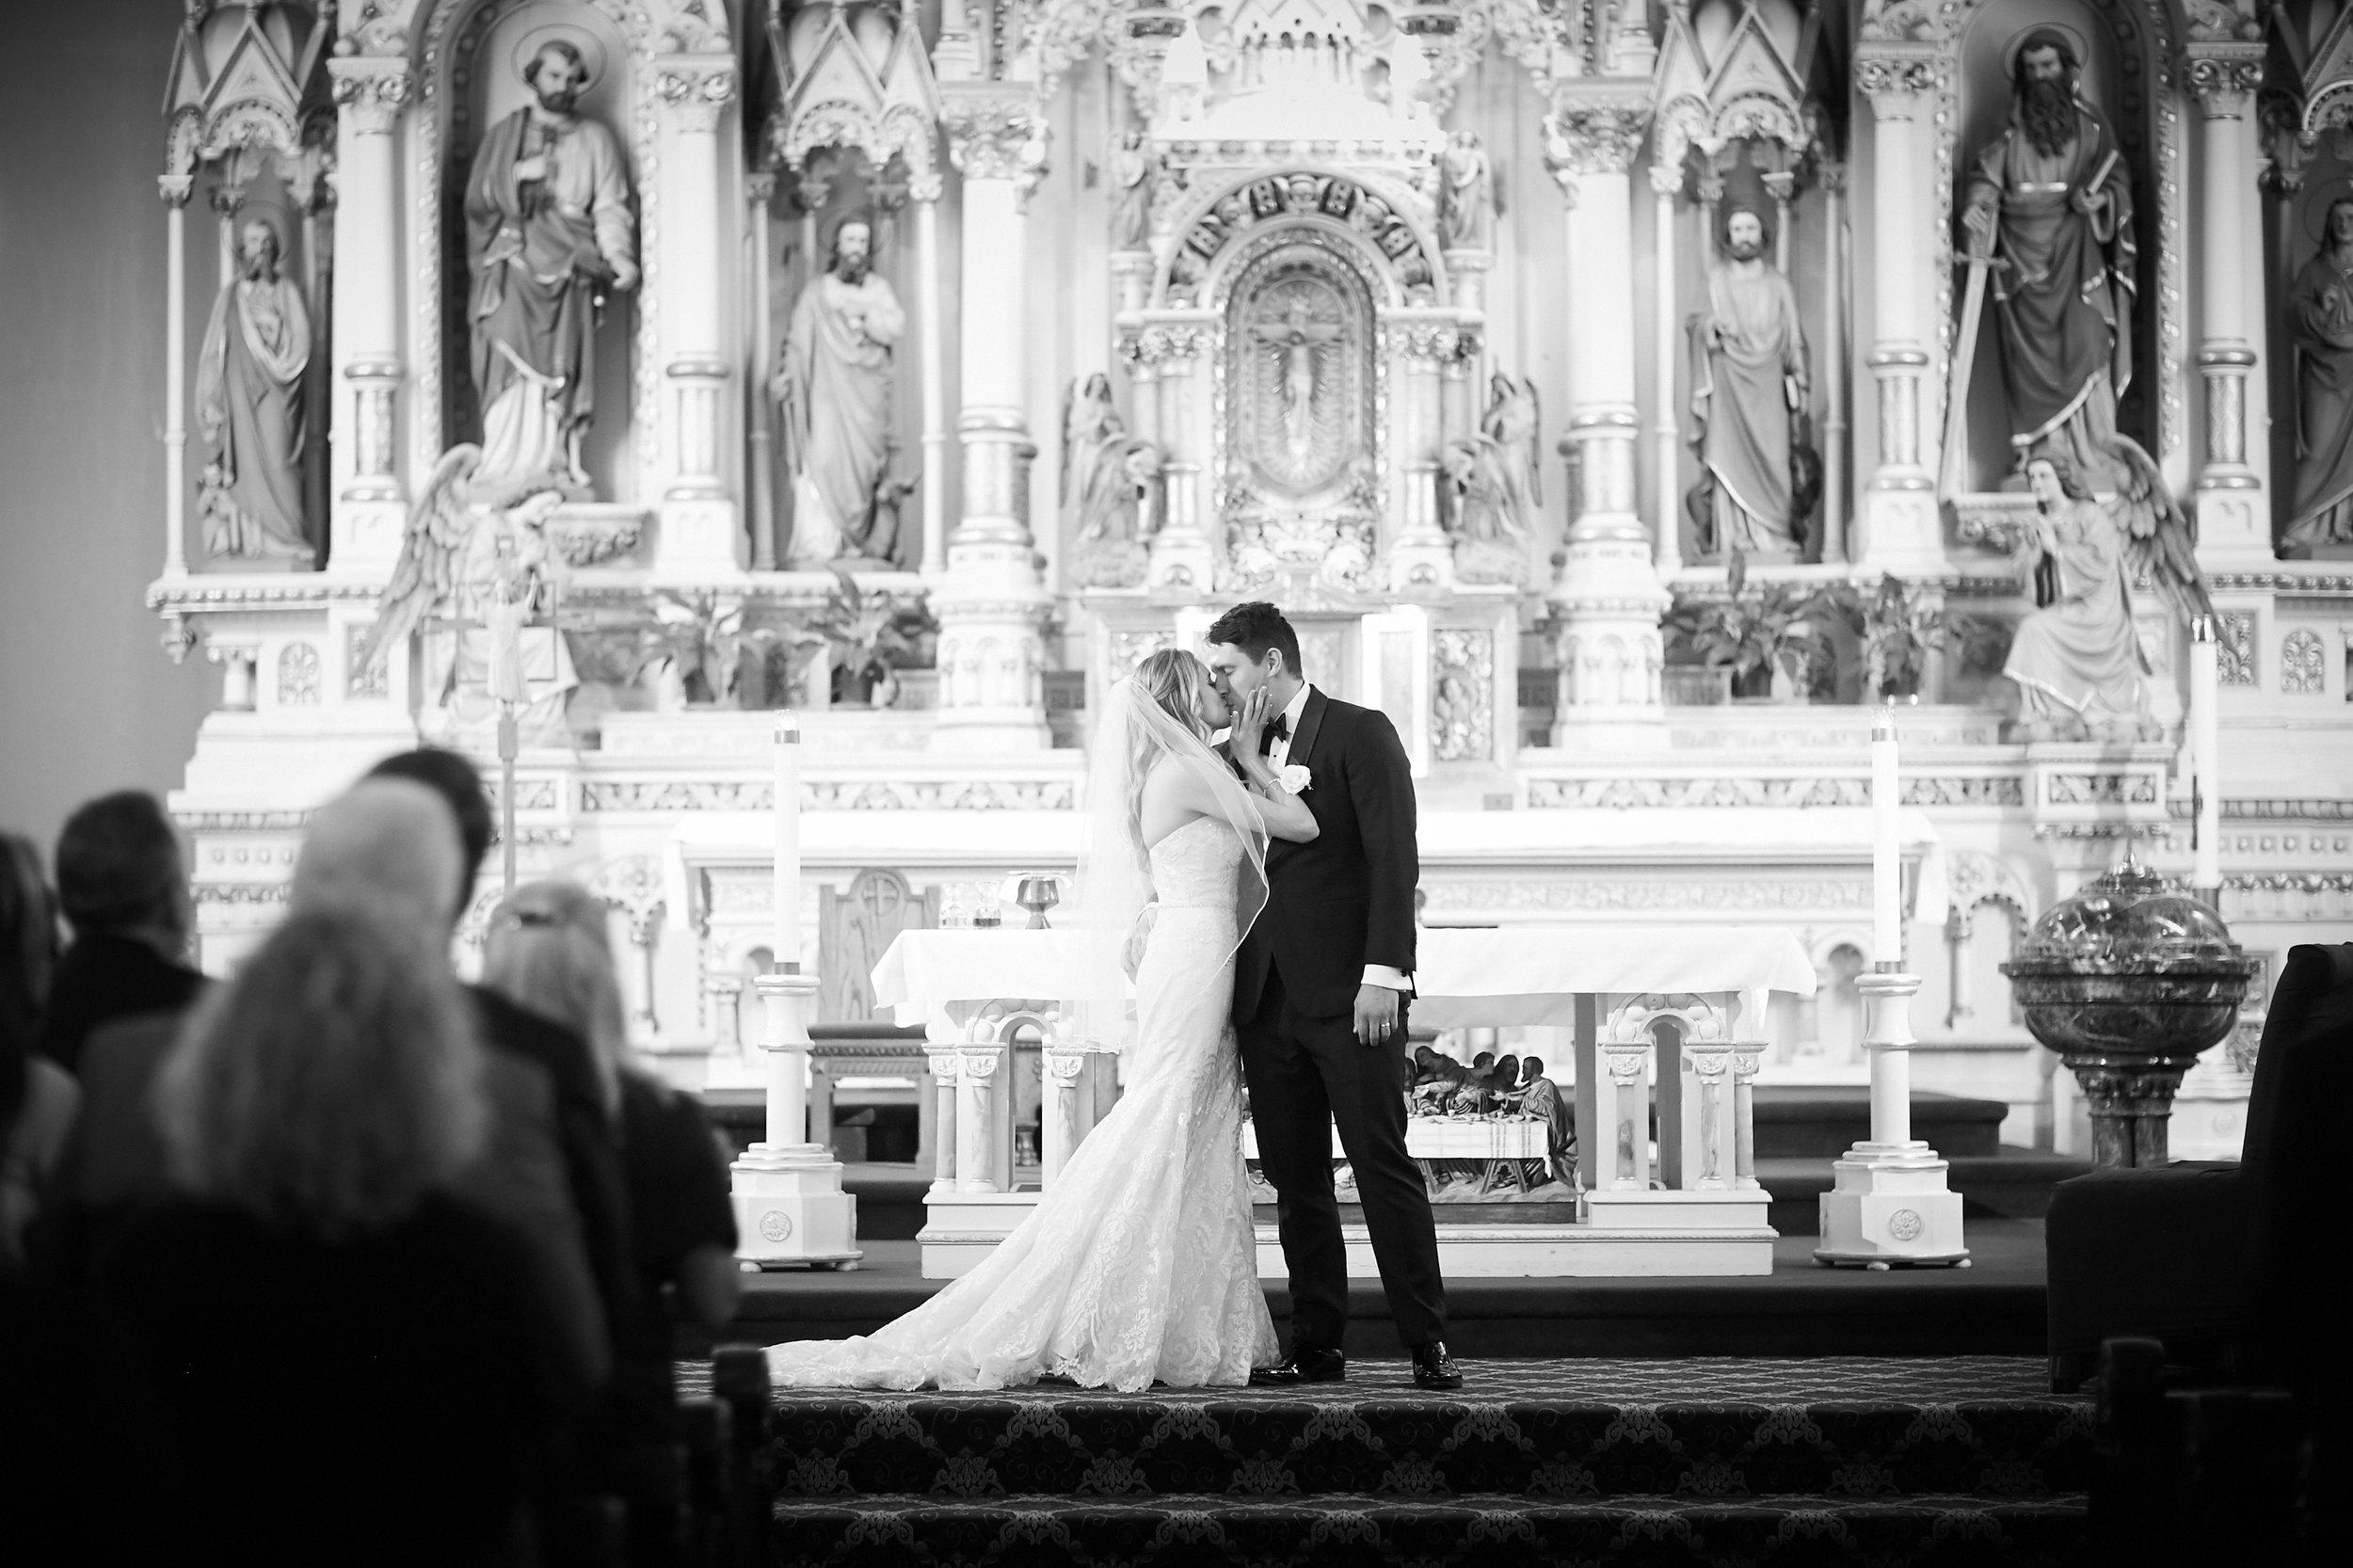 wedding ceremony kiss bride groom